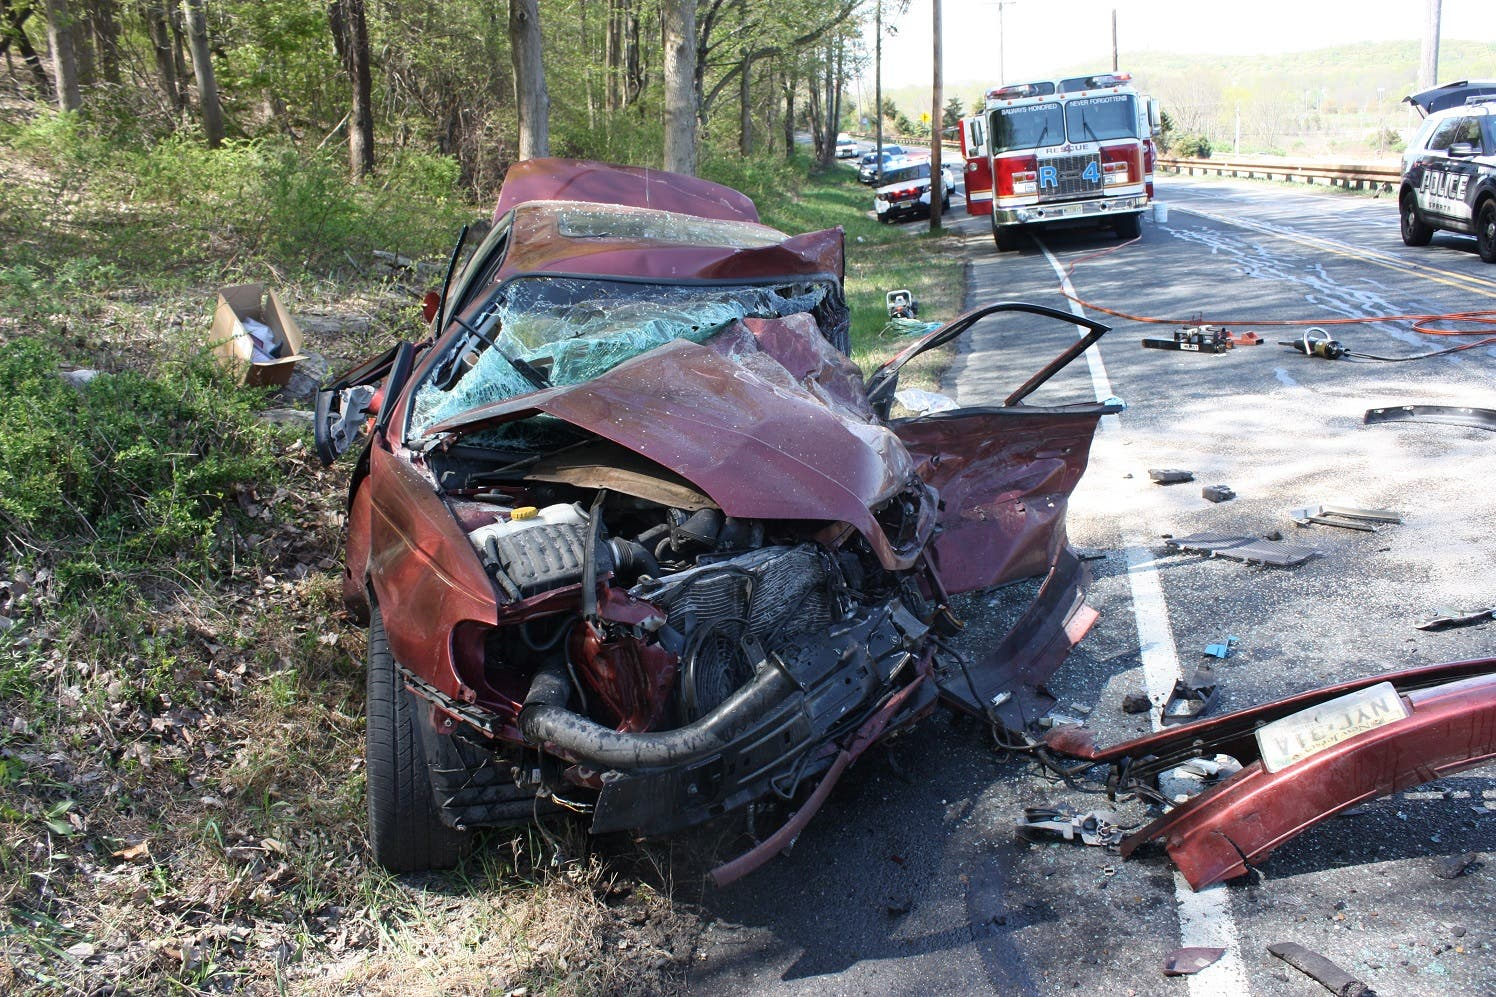 Borough Man Involved in Fatal Northern New Jersey Car Crash